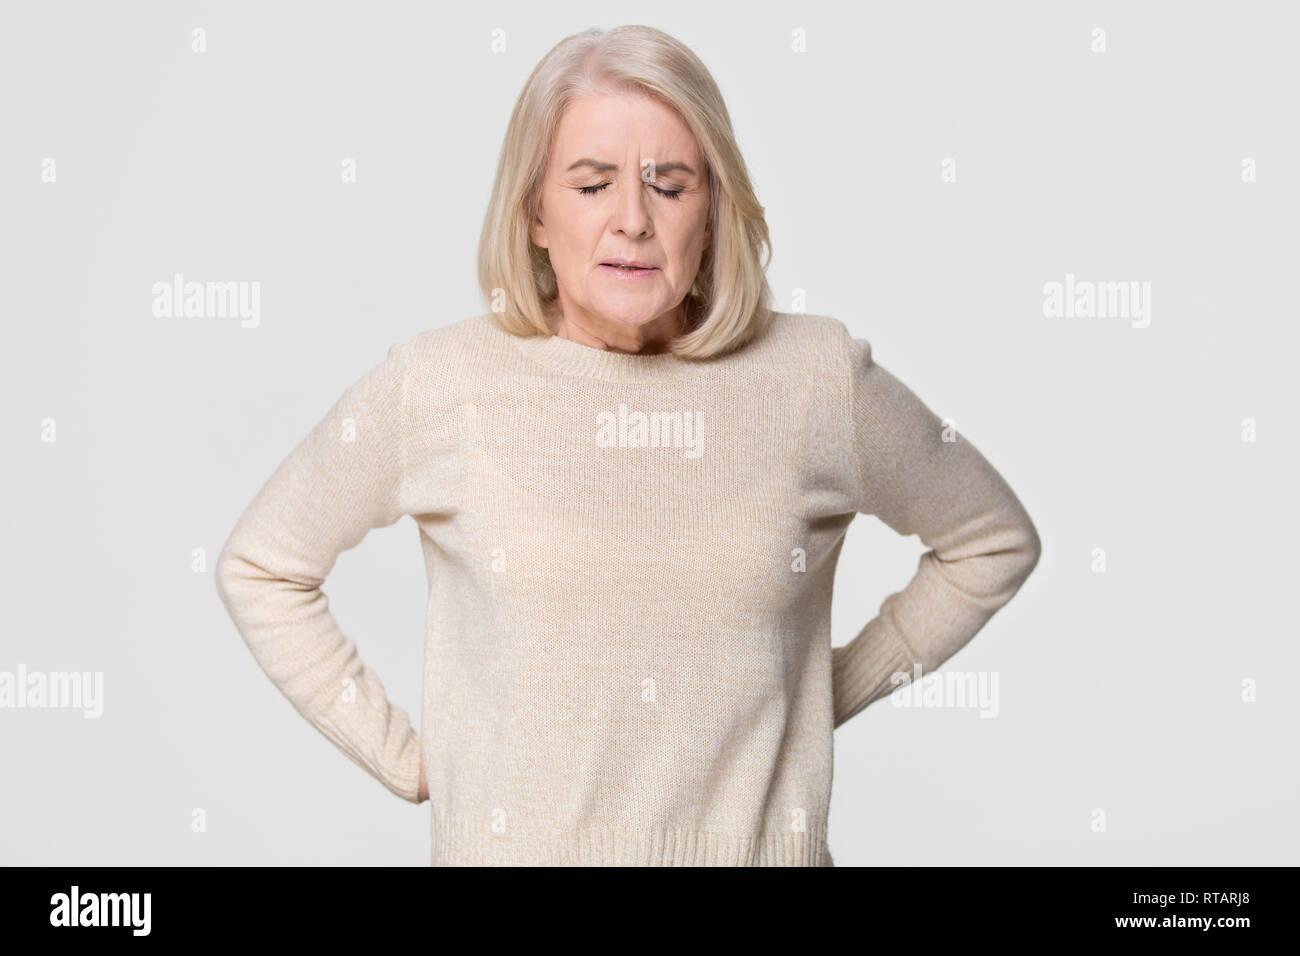 Upset old woman touching back feeling pain isolated on background - Stock Image